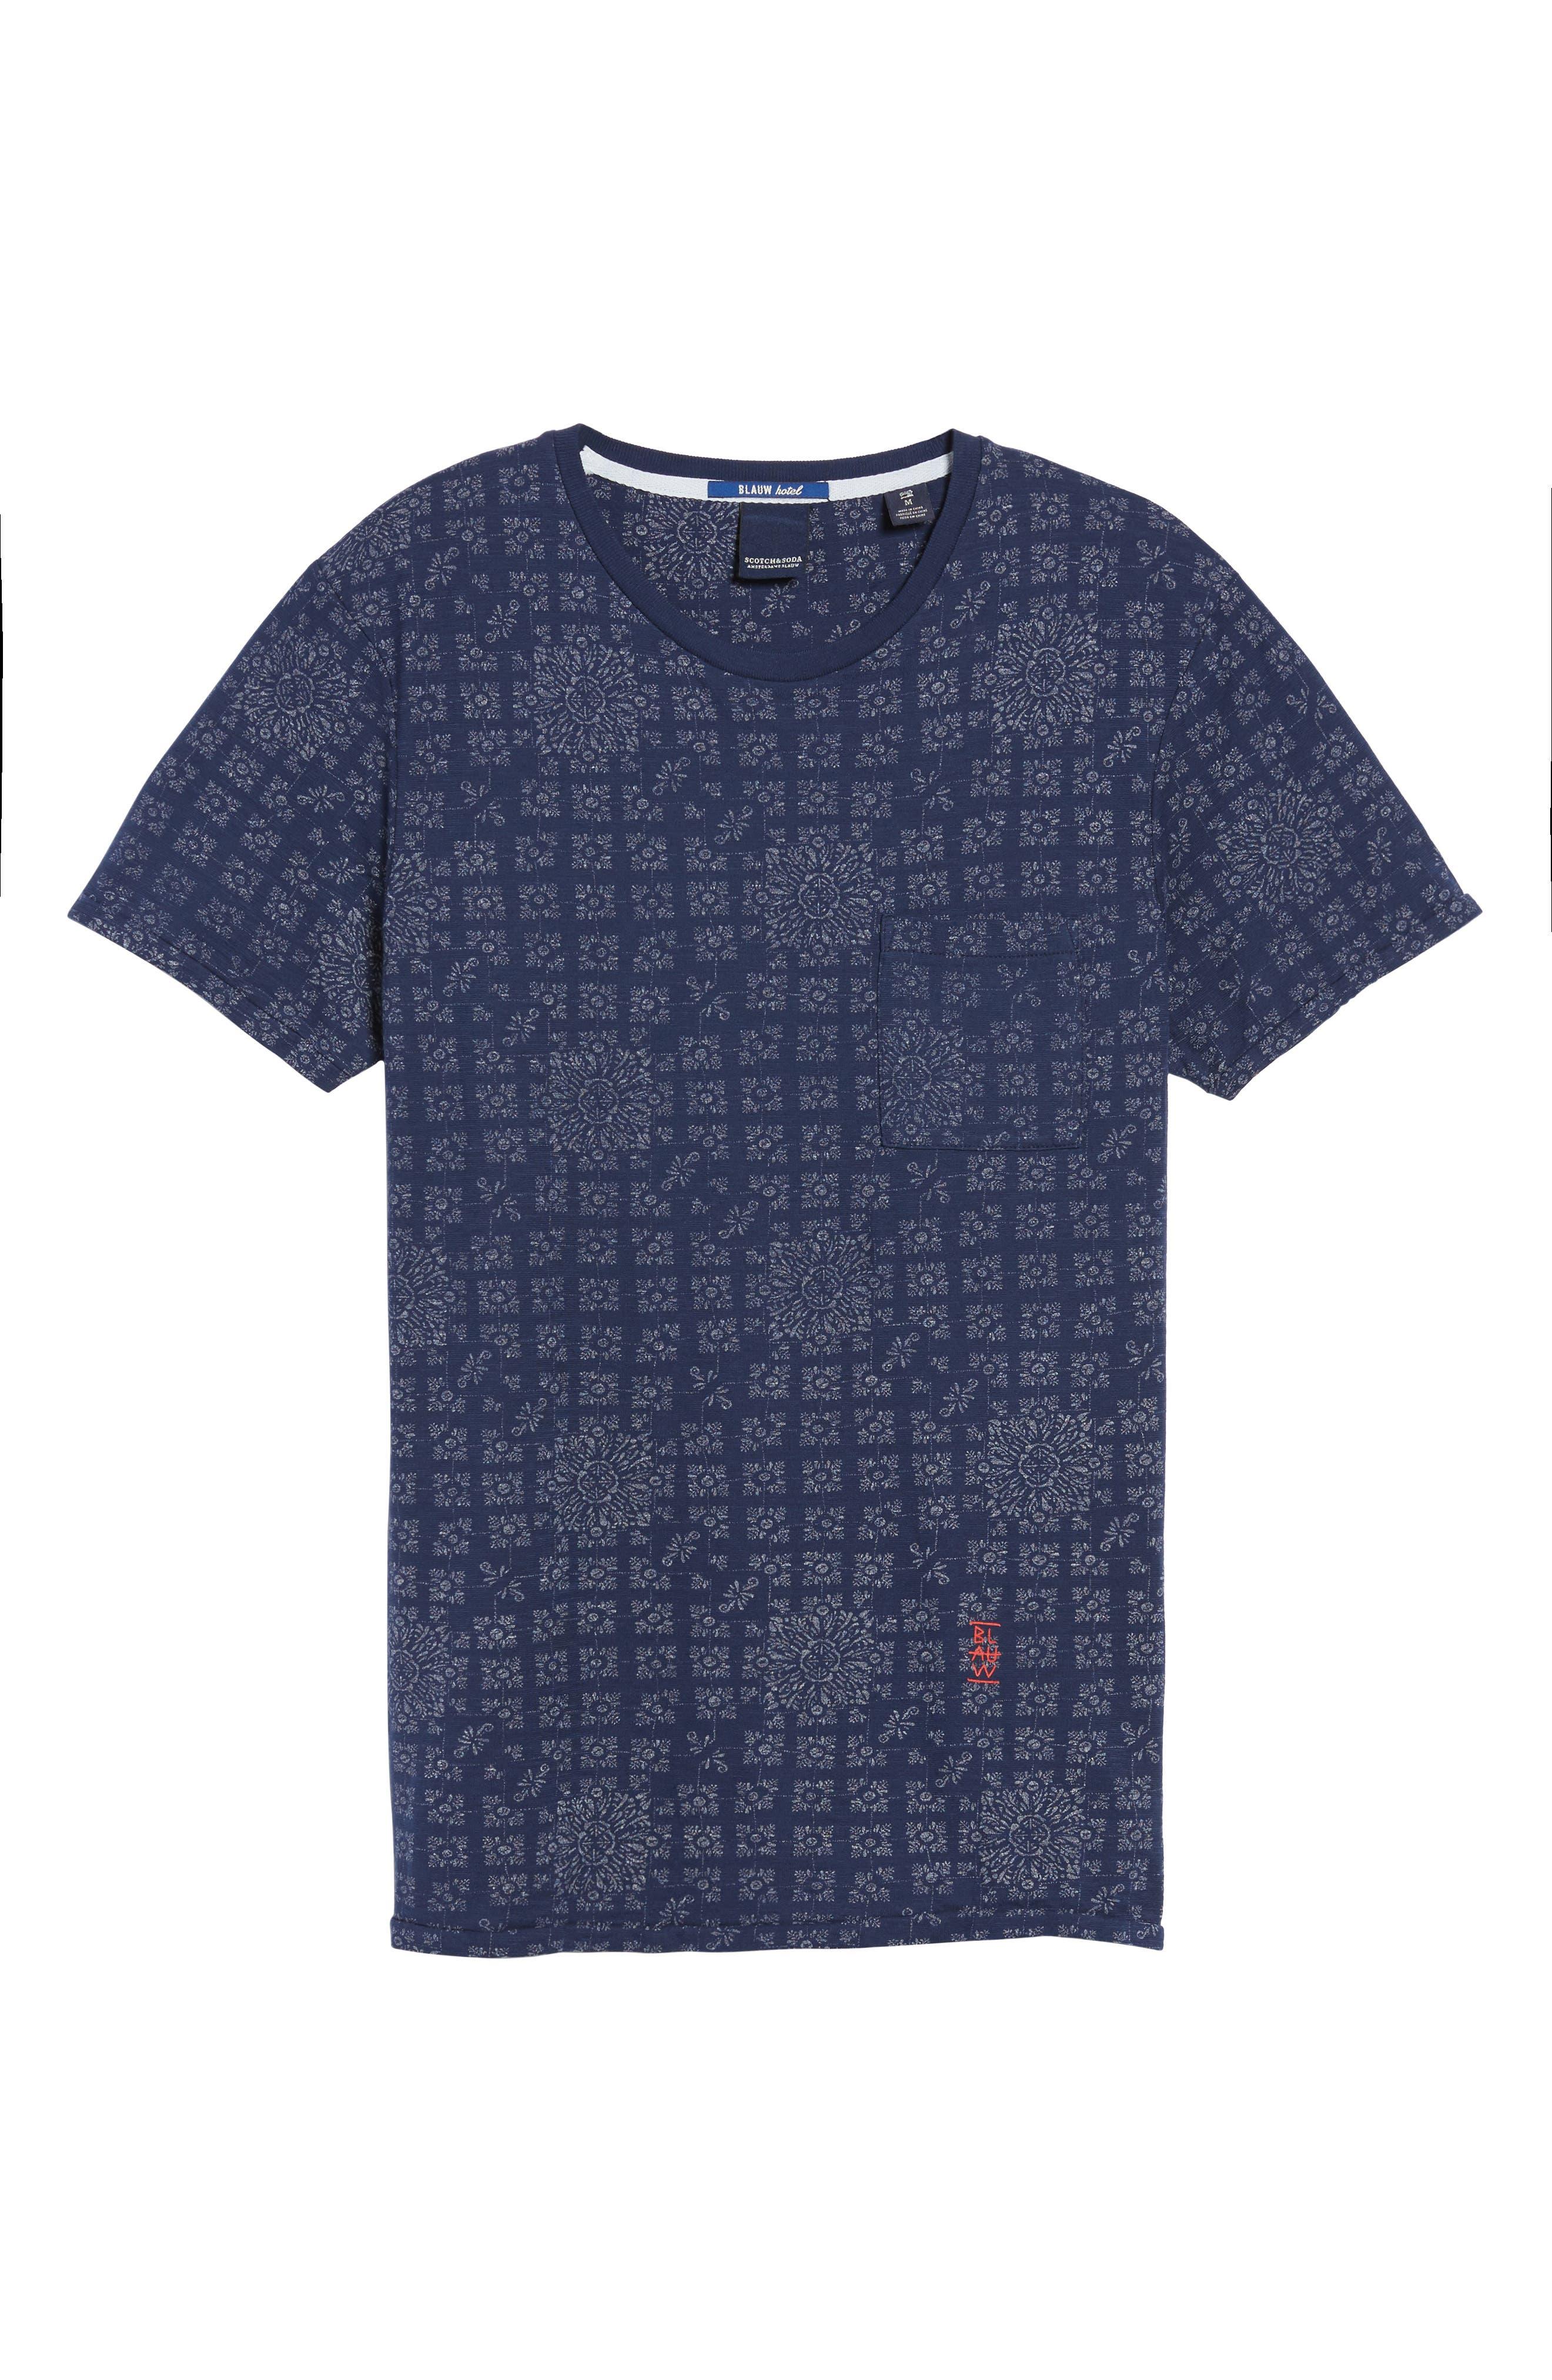 AMS Graphic T-Shirt,                             Alternate thumbnail 5, color,                             Combo D